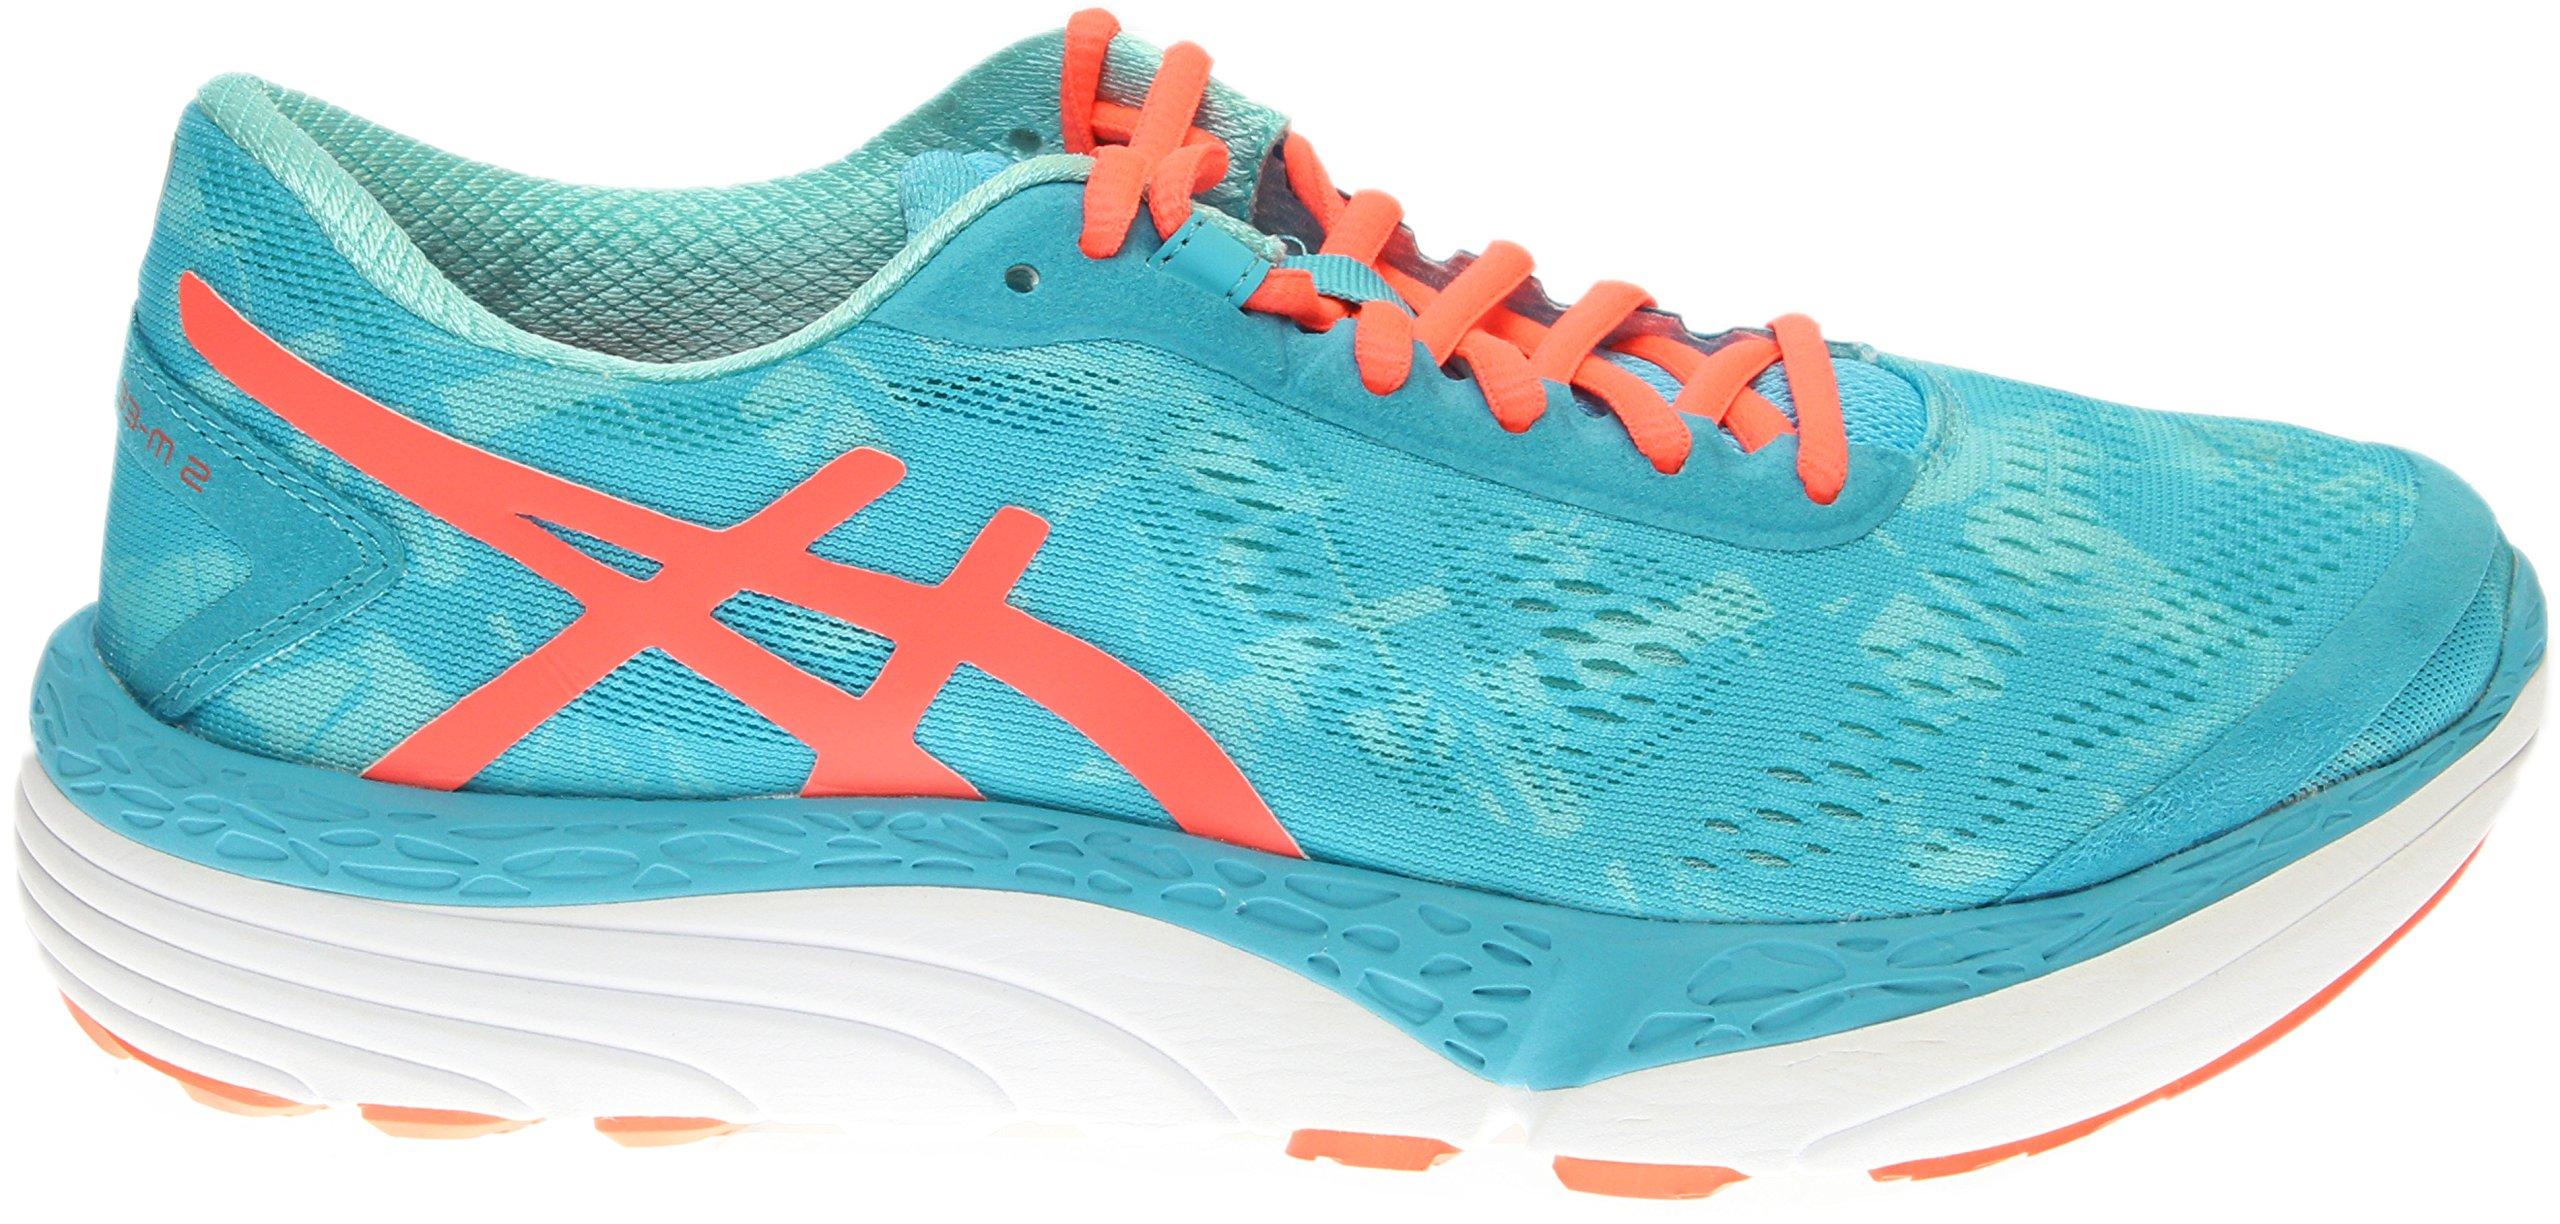 ASICS Women's 33-M 2 Running Shoe, Aquarium/Flash Coral/Aruba Blue, 9.5 M US by ASICS (Image #2)